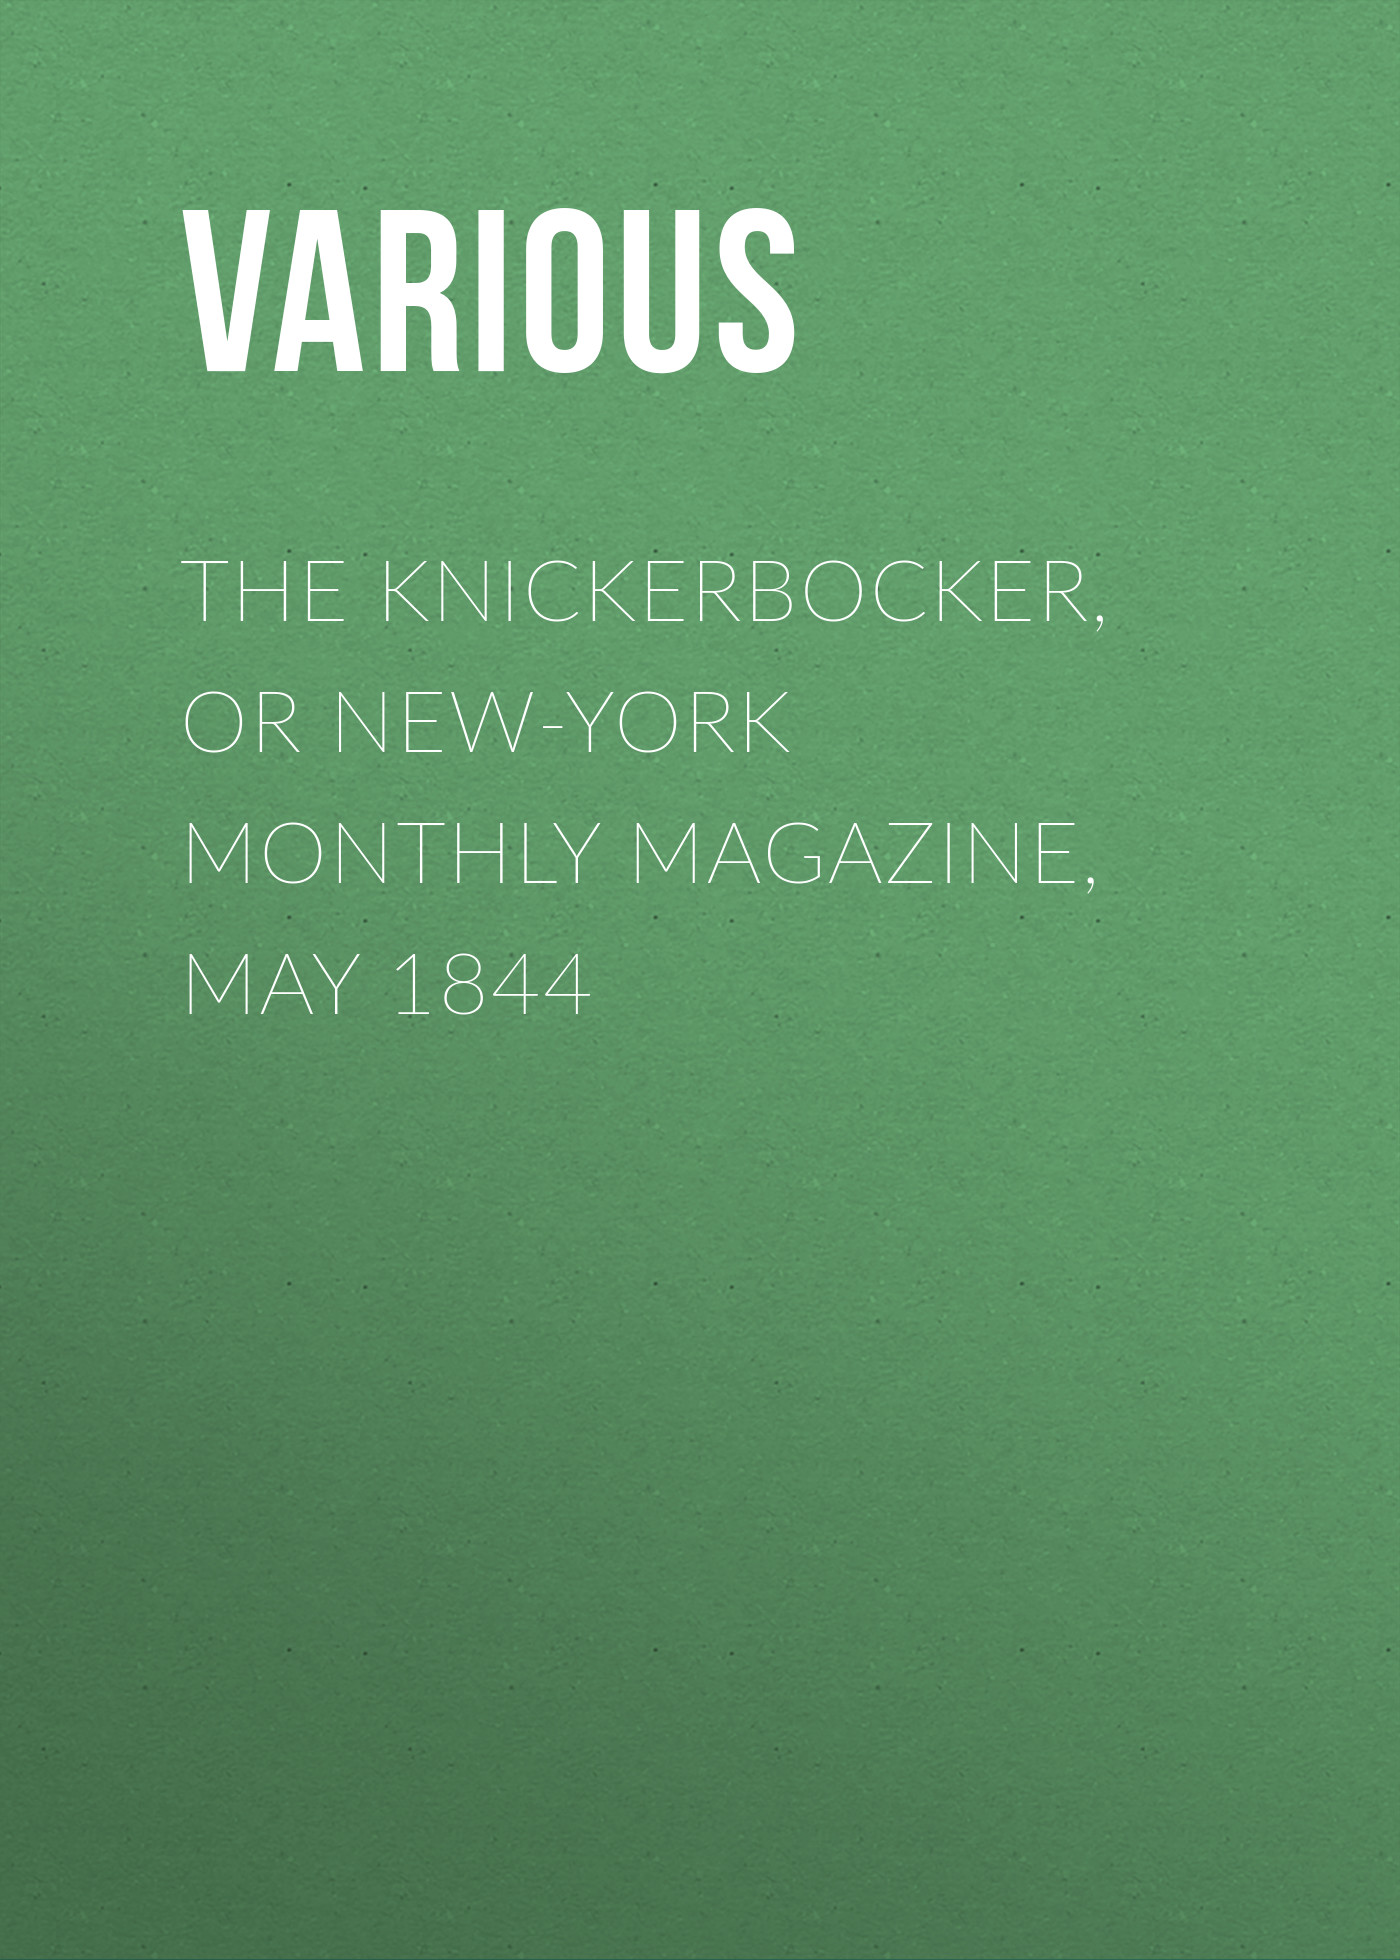 Various The Knickerbocker, or New-York Monthly Magazine, May 1844 maura jacobson new york magazine crosswords volume 7